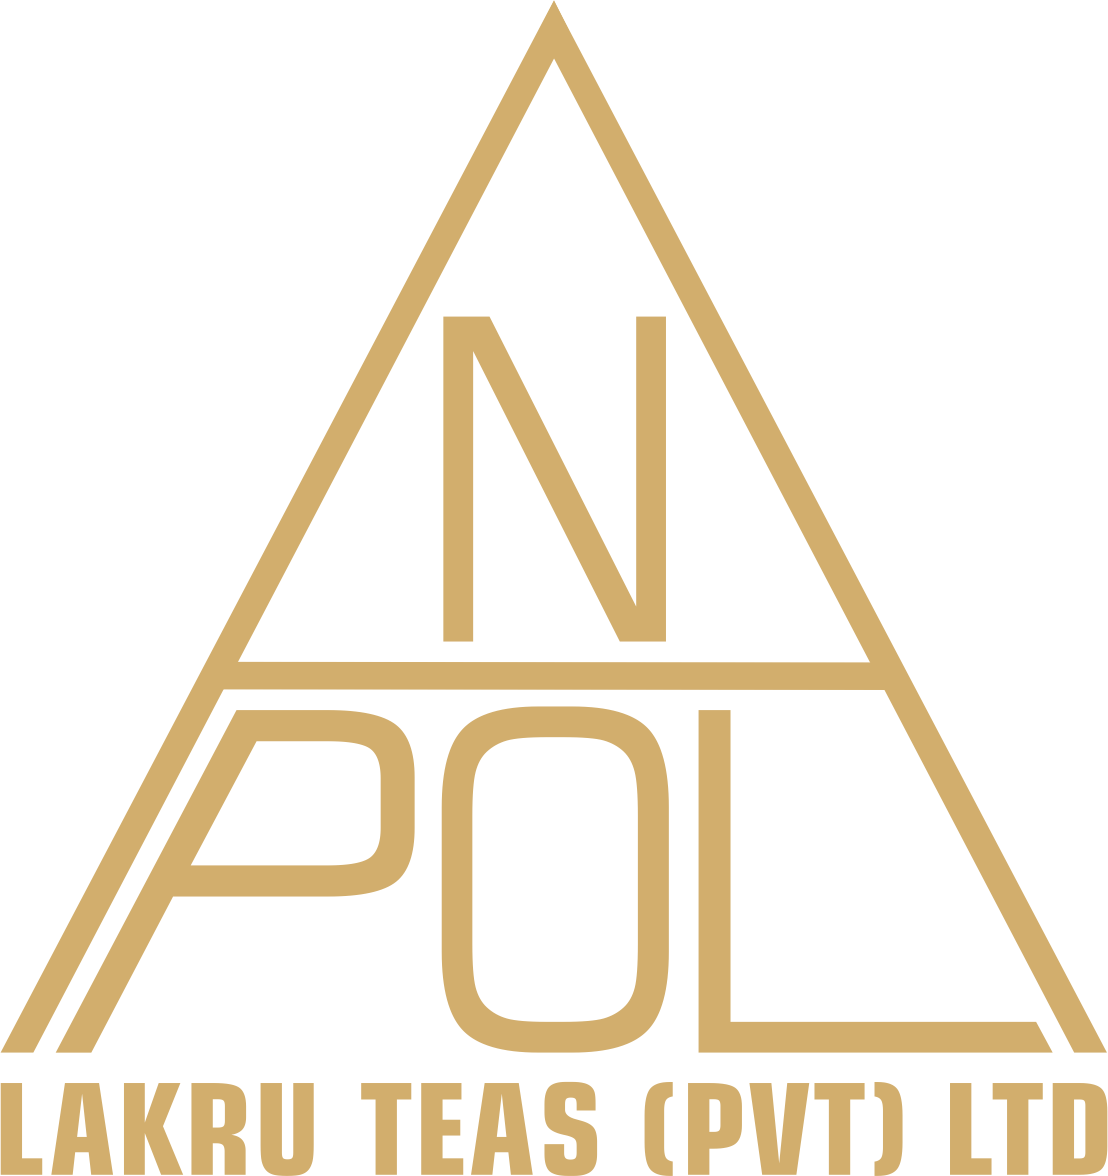 Ceylon Tea Exporter | Lakru Teas (Pvt) Ltd